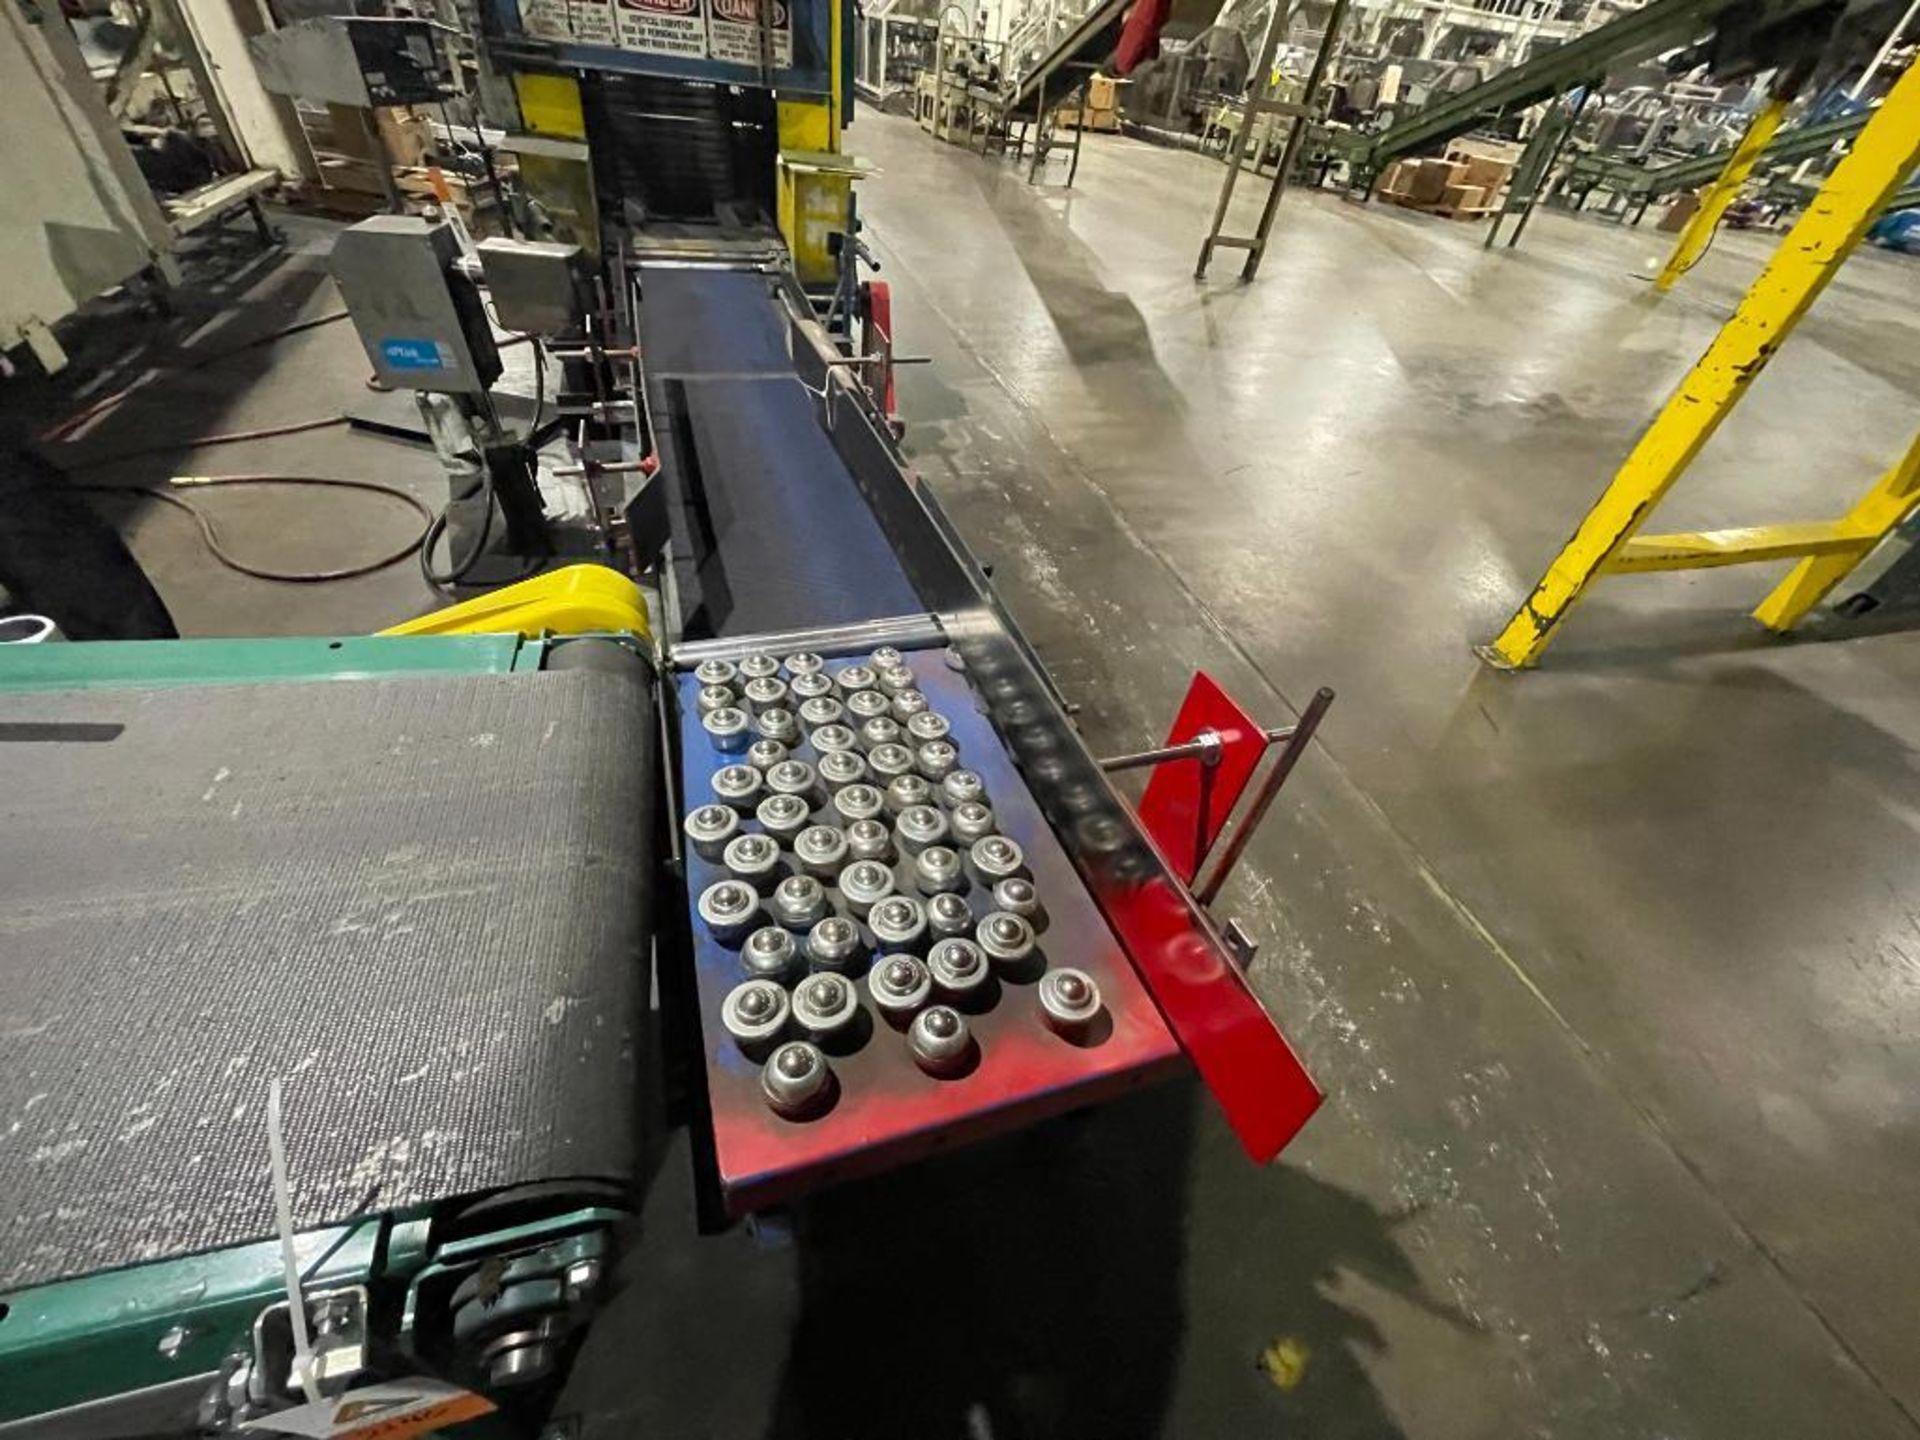 mild steel conveyor - Image 2 of 11